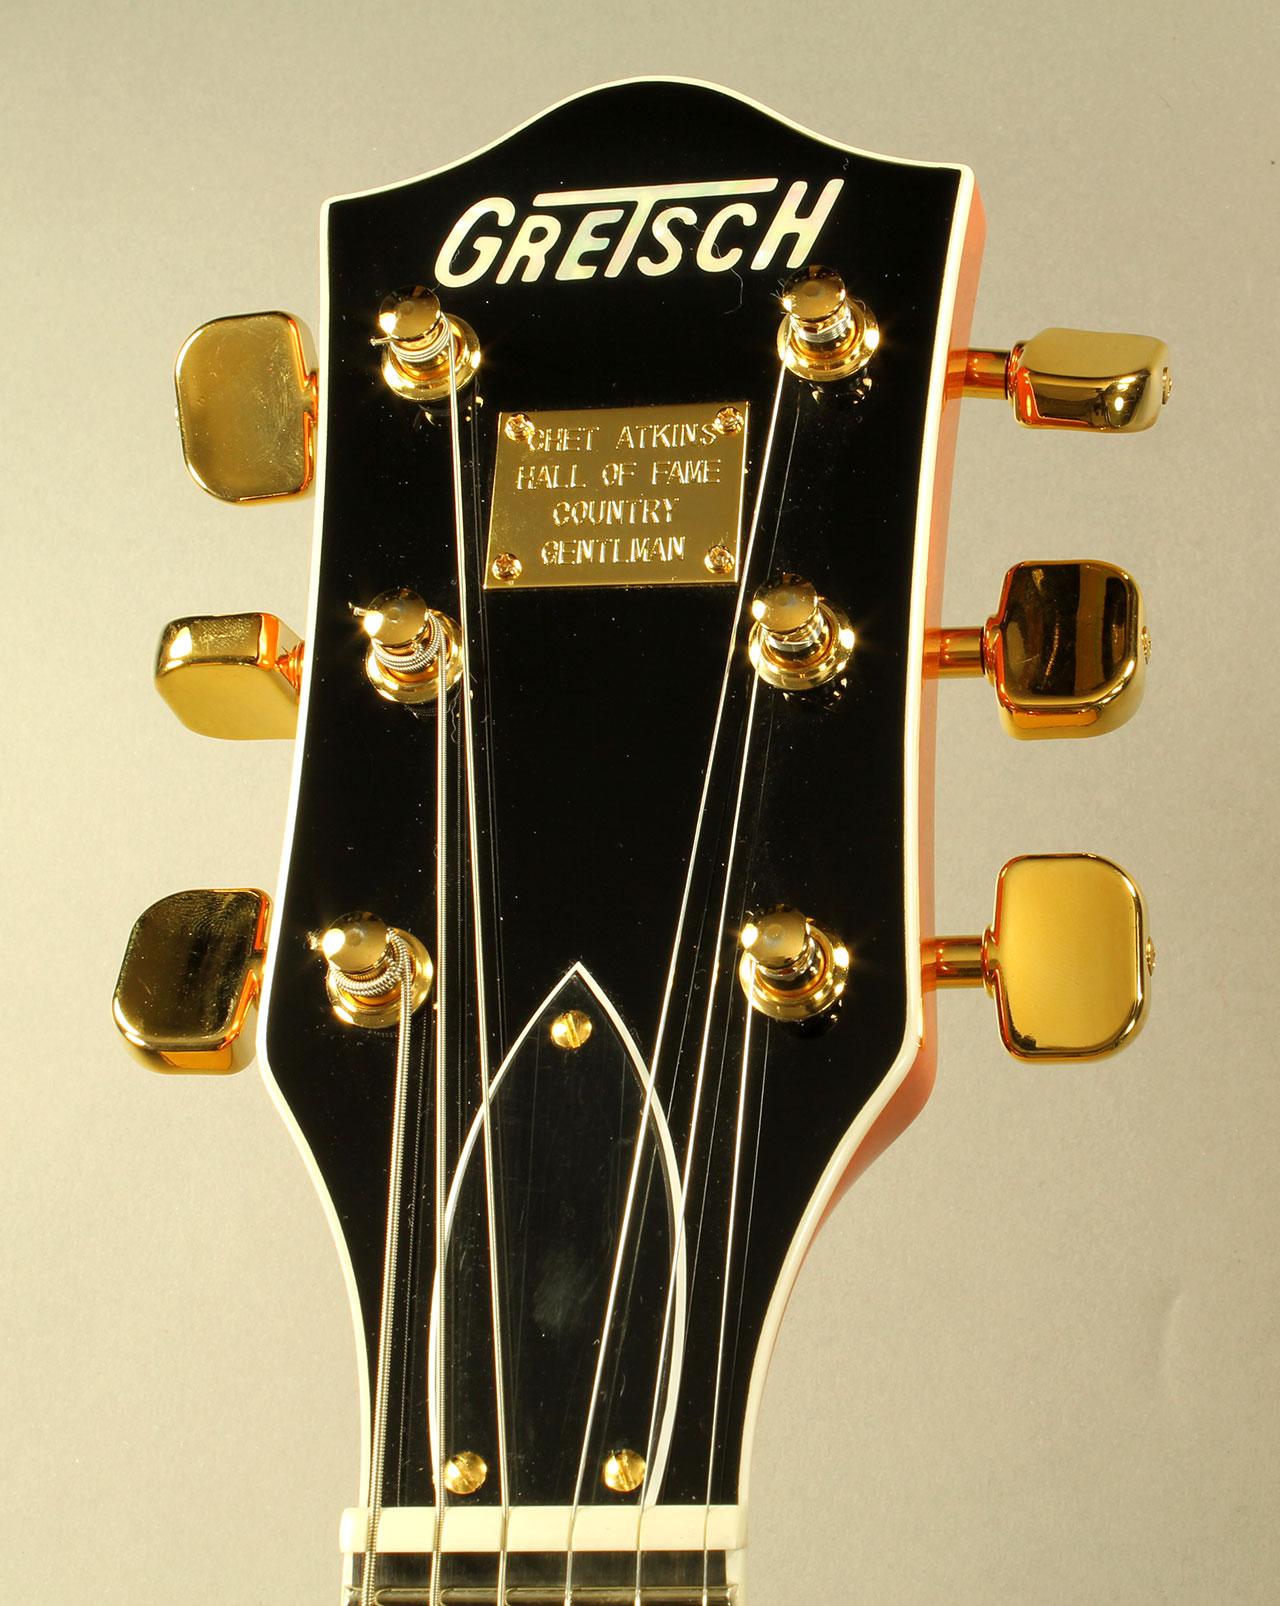 gretsch-chet-atkins-halloffame-c-gent-head-front-1